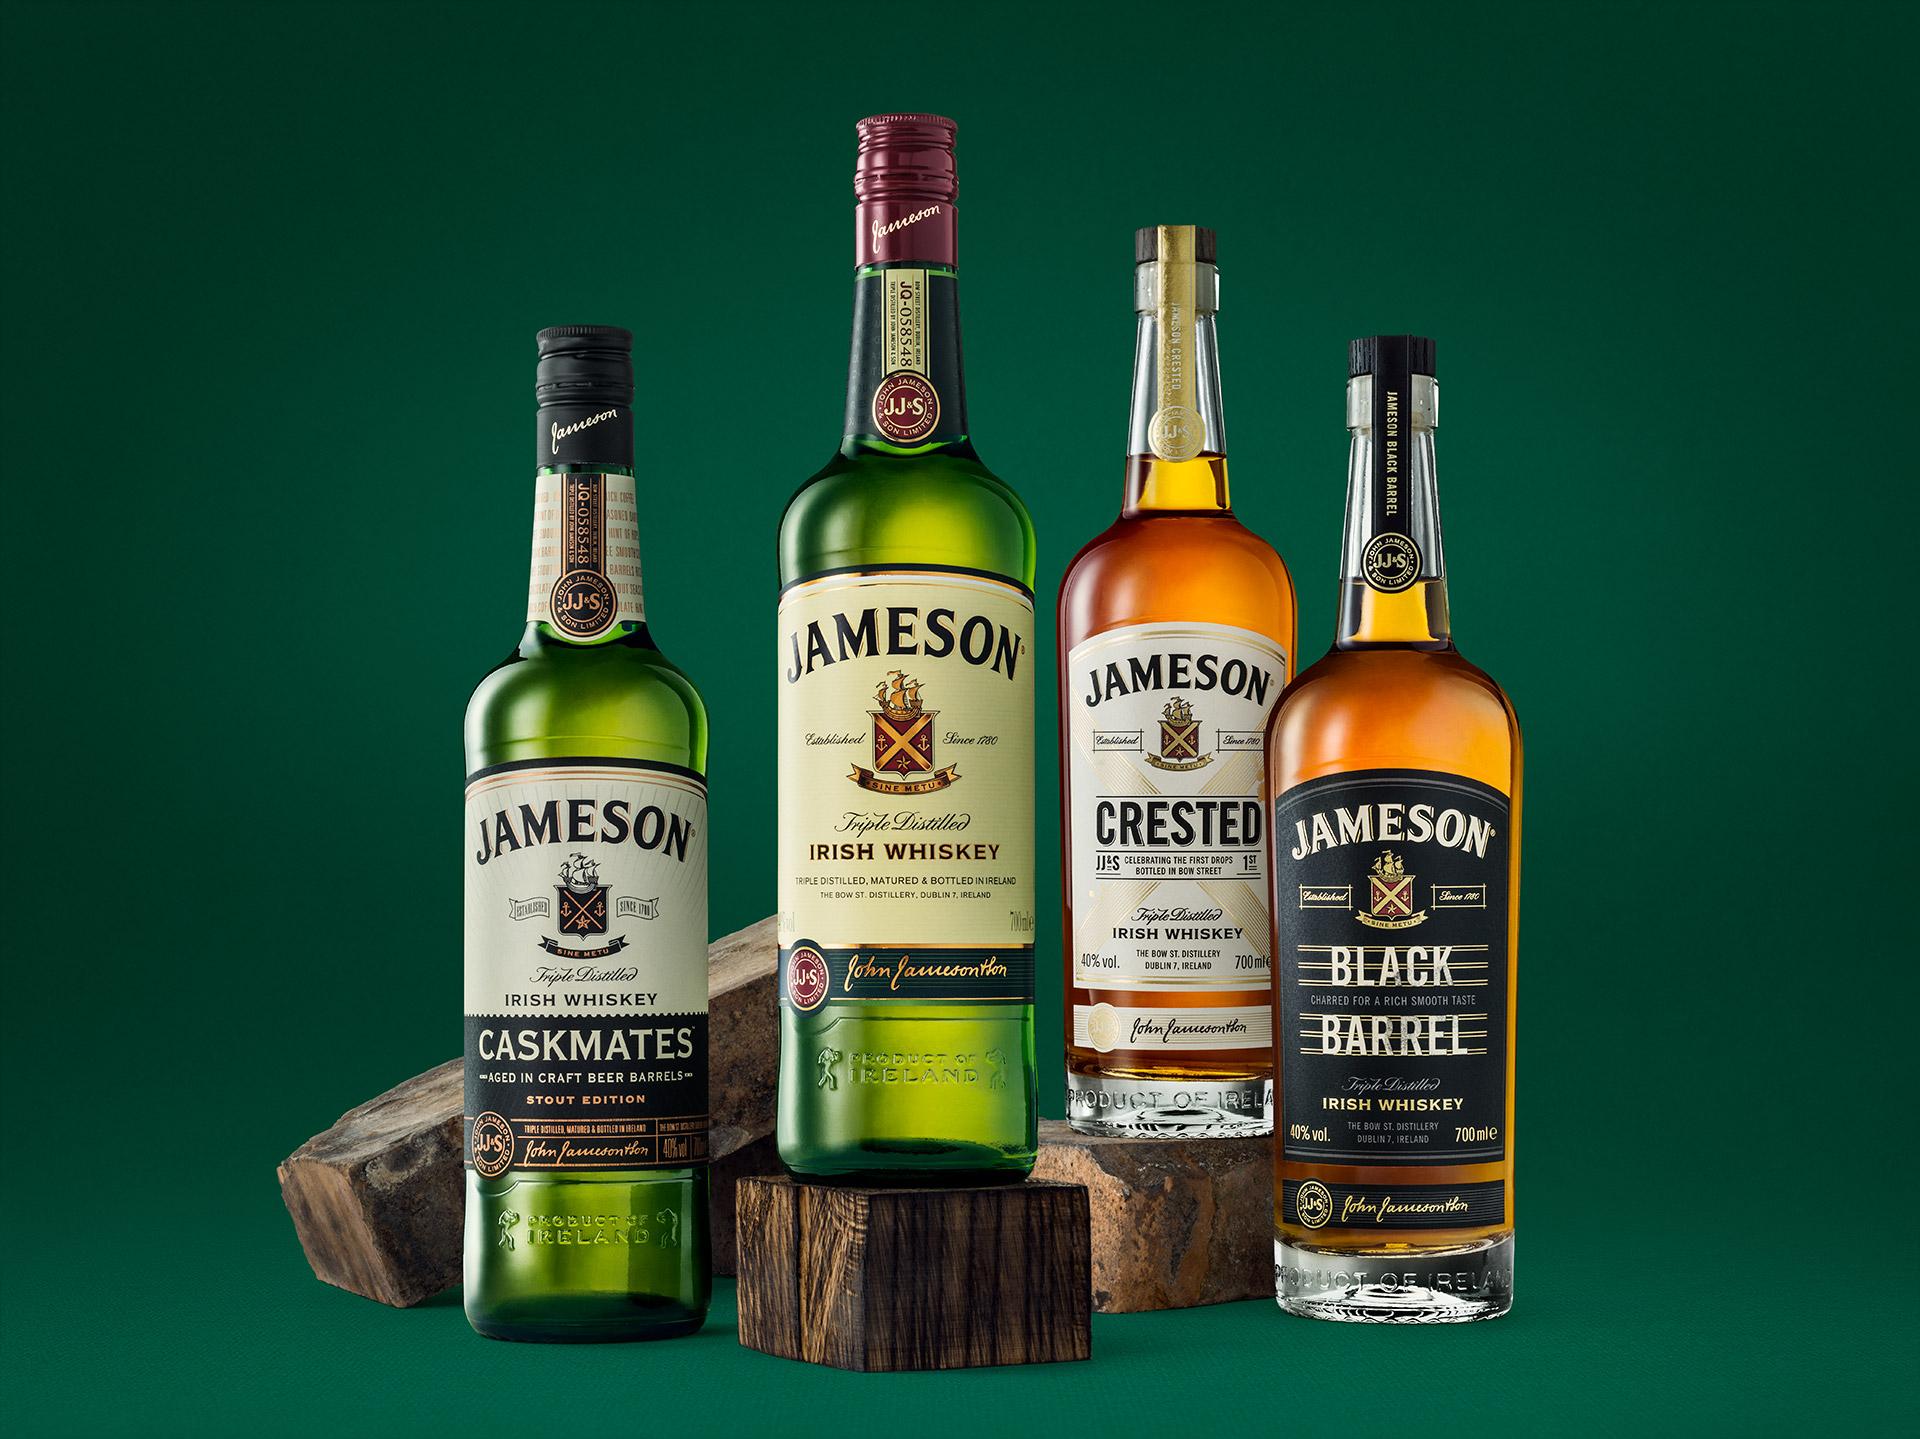 jameson_corporate_family_1_green_WEB.jpg